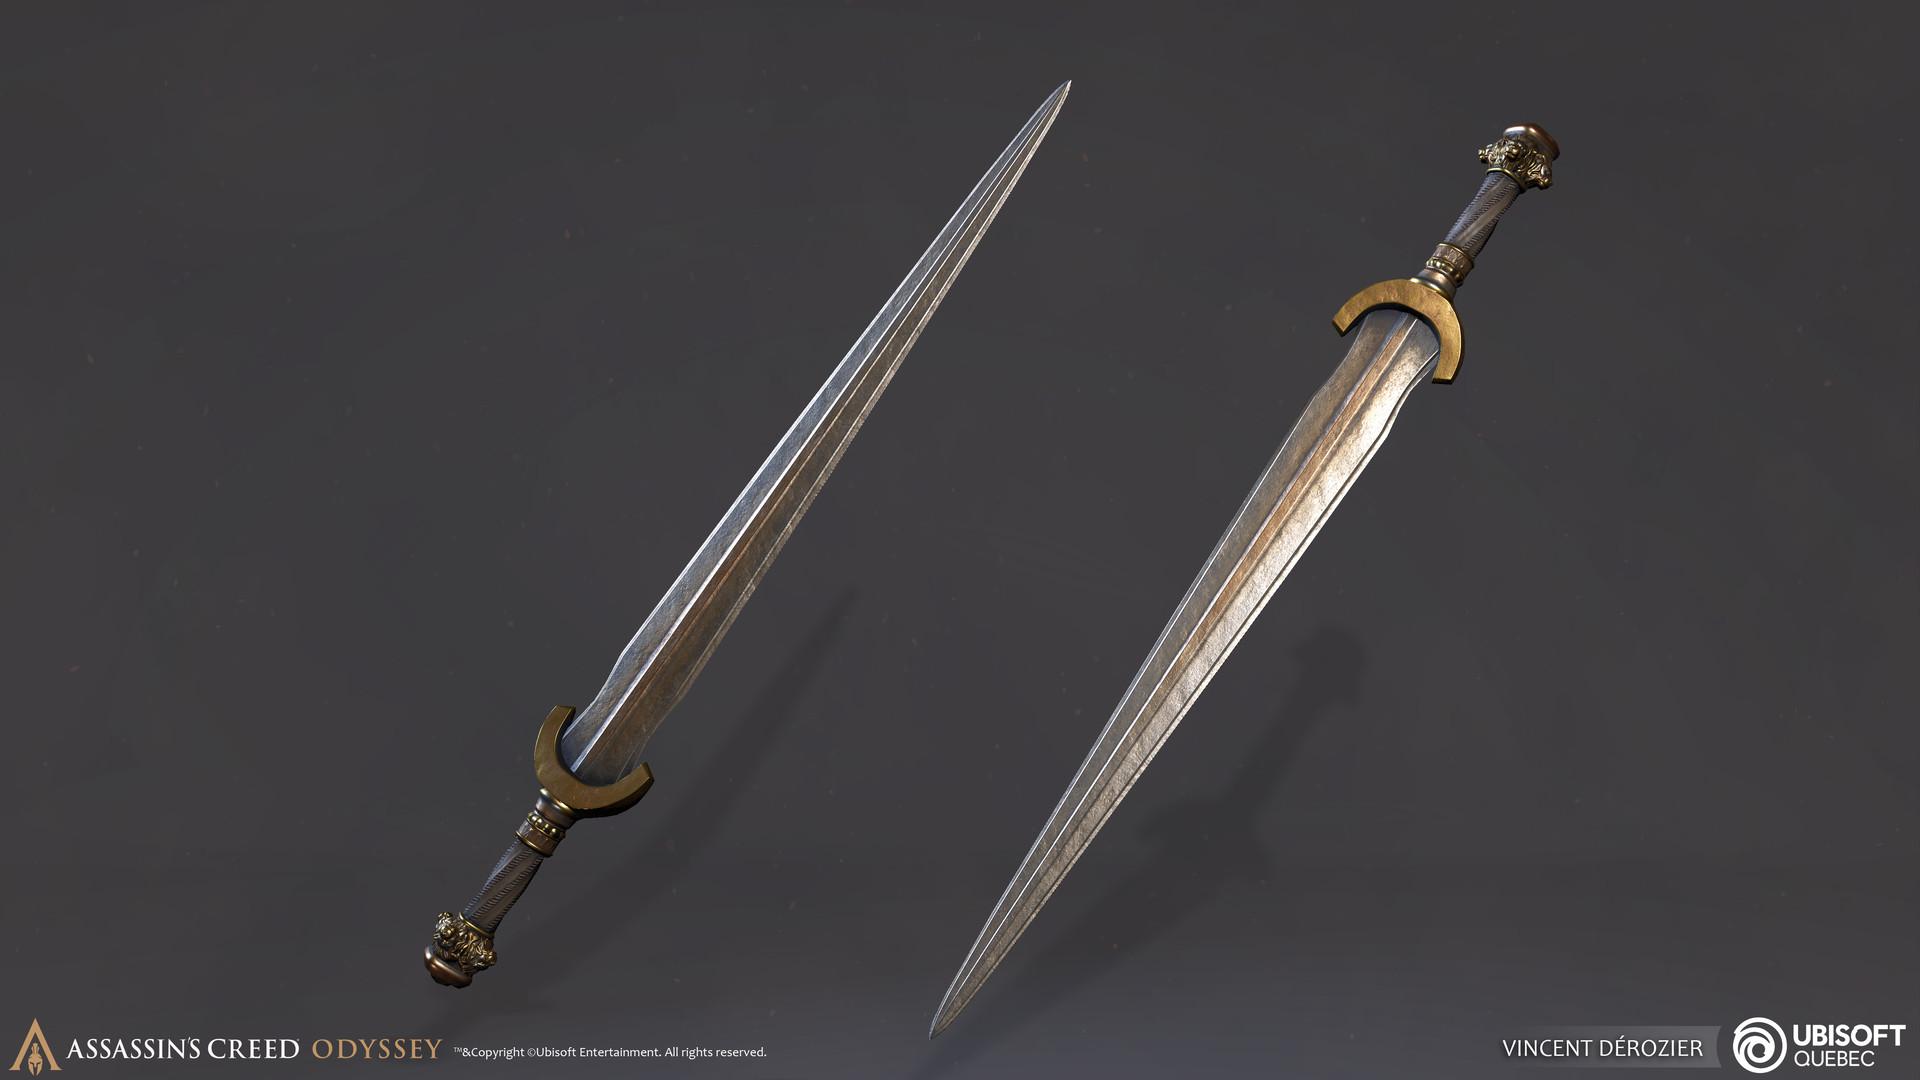 Vincent derozier props sword 2